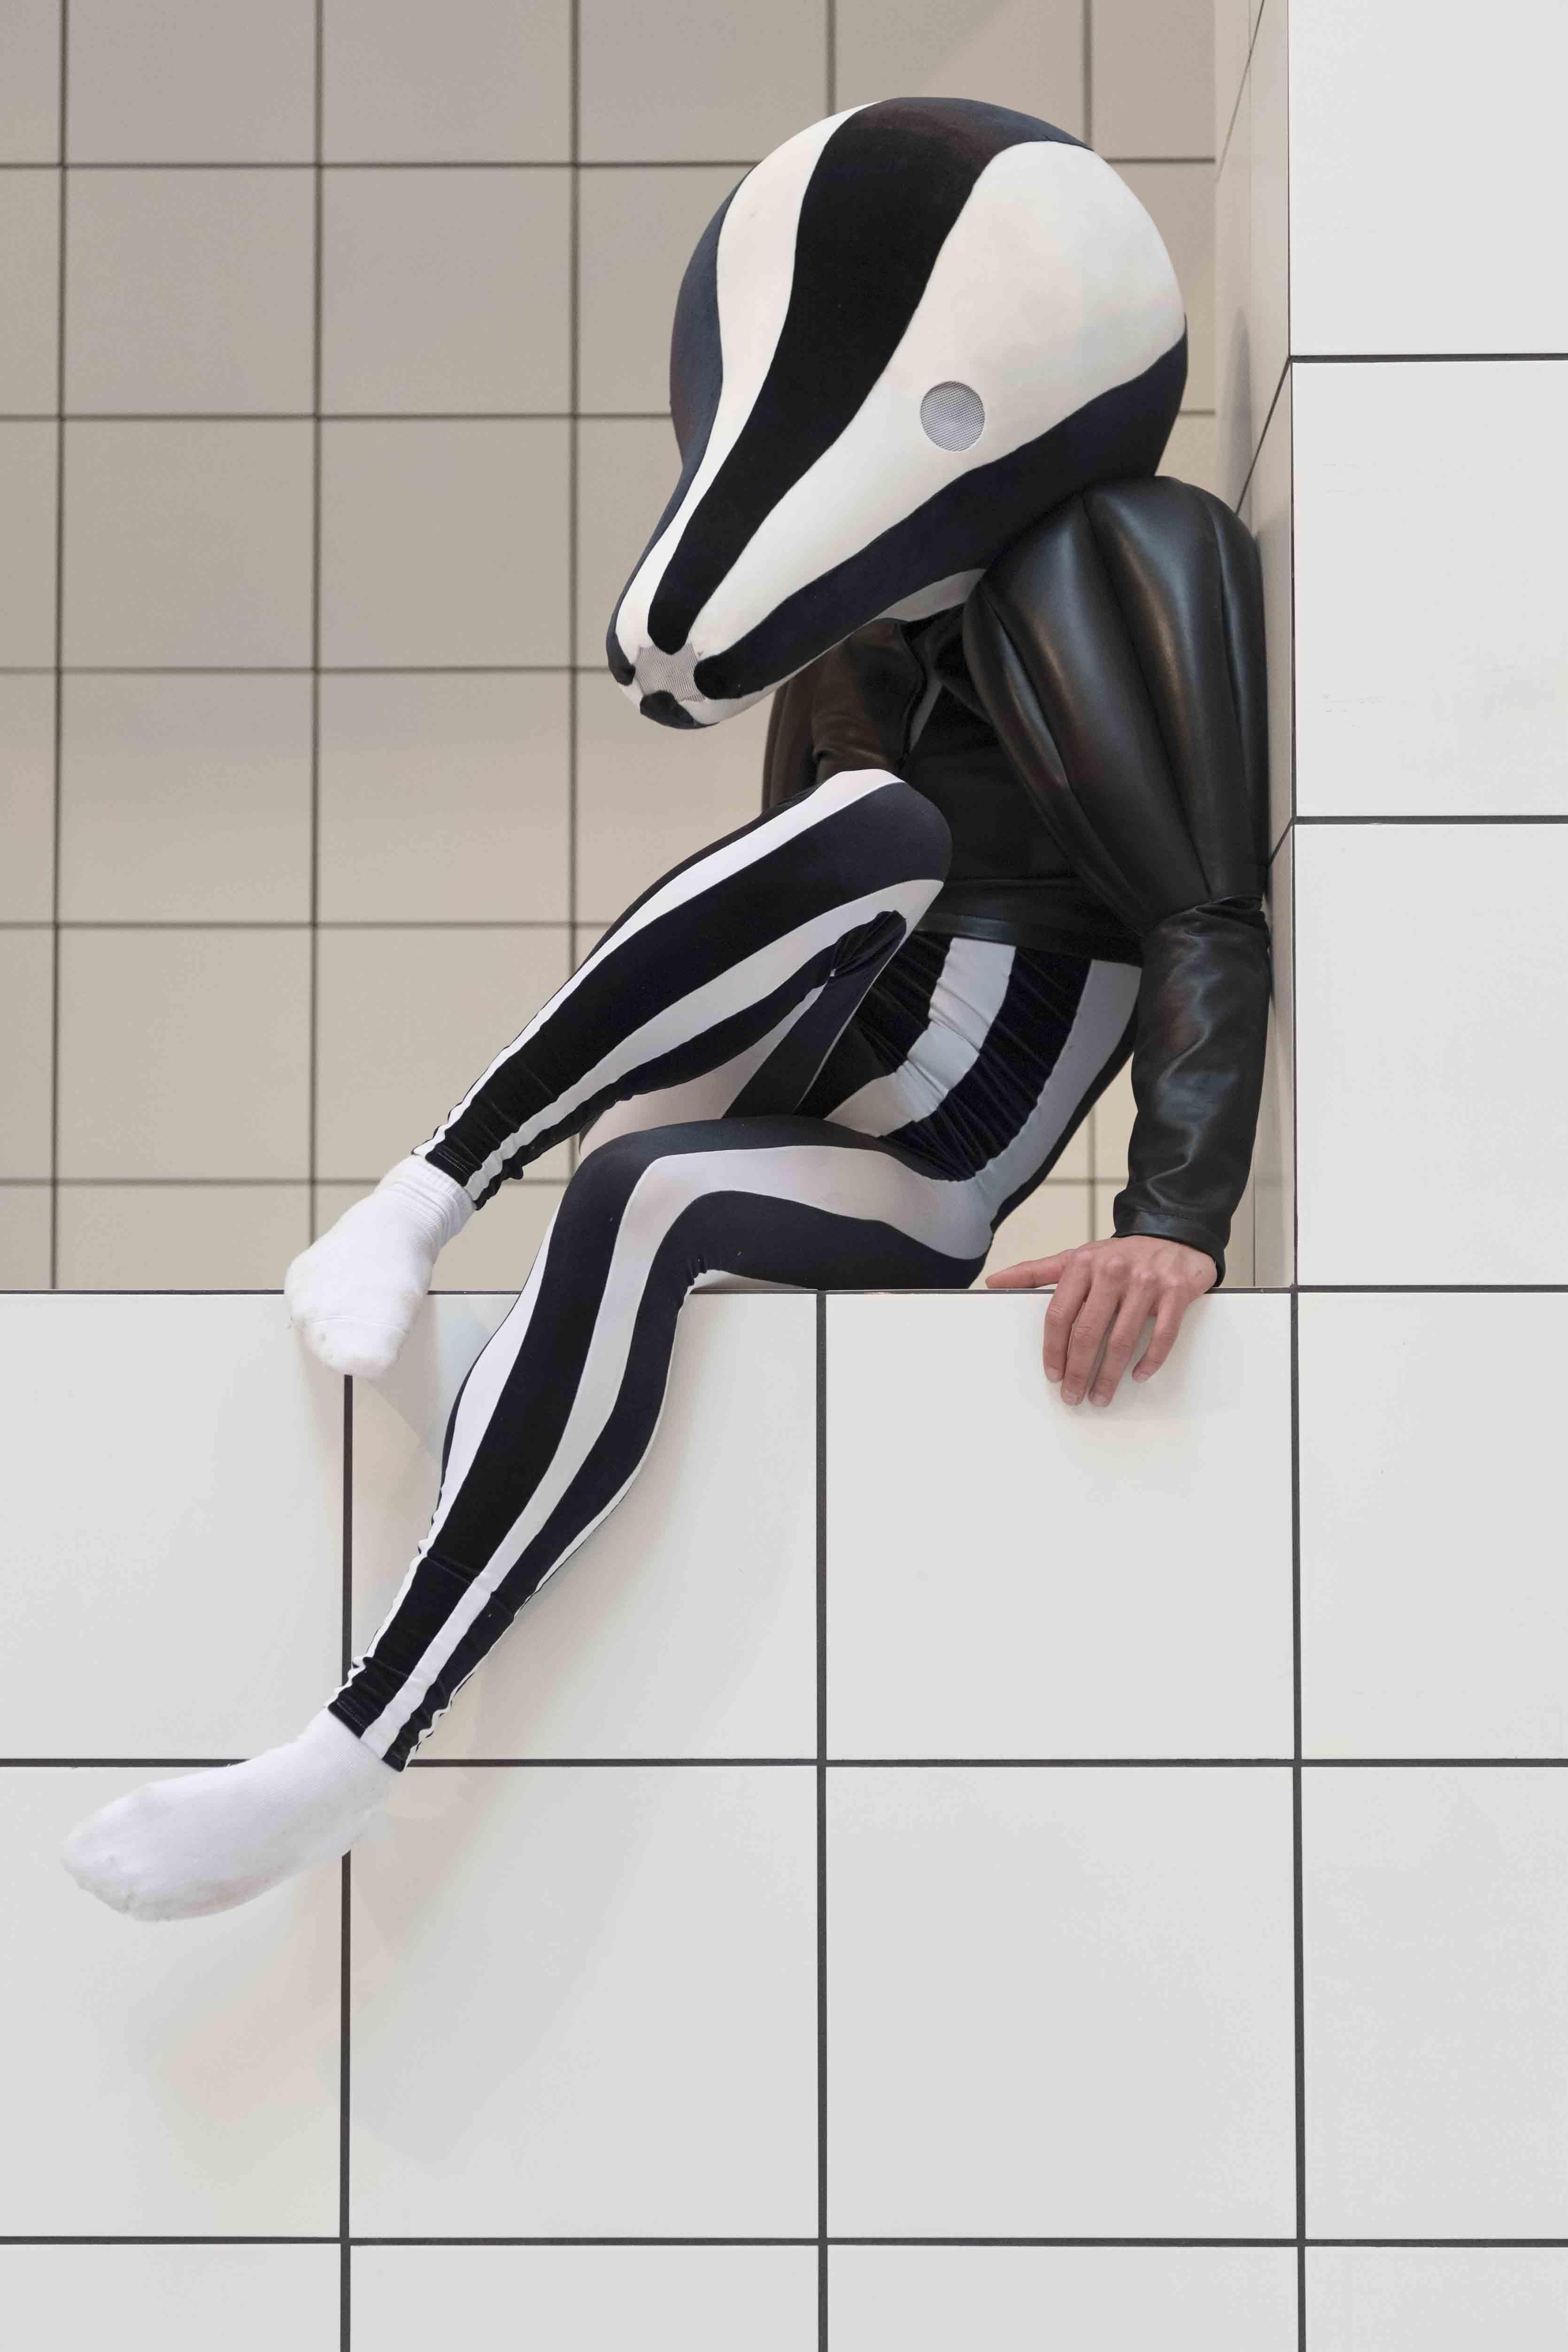 Tate (Seraphina Neville) 2018